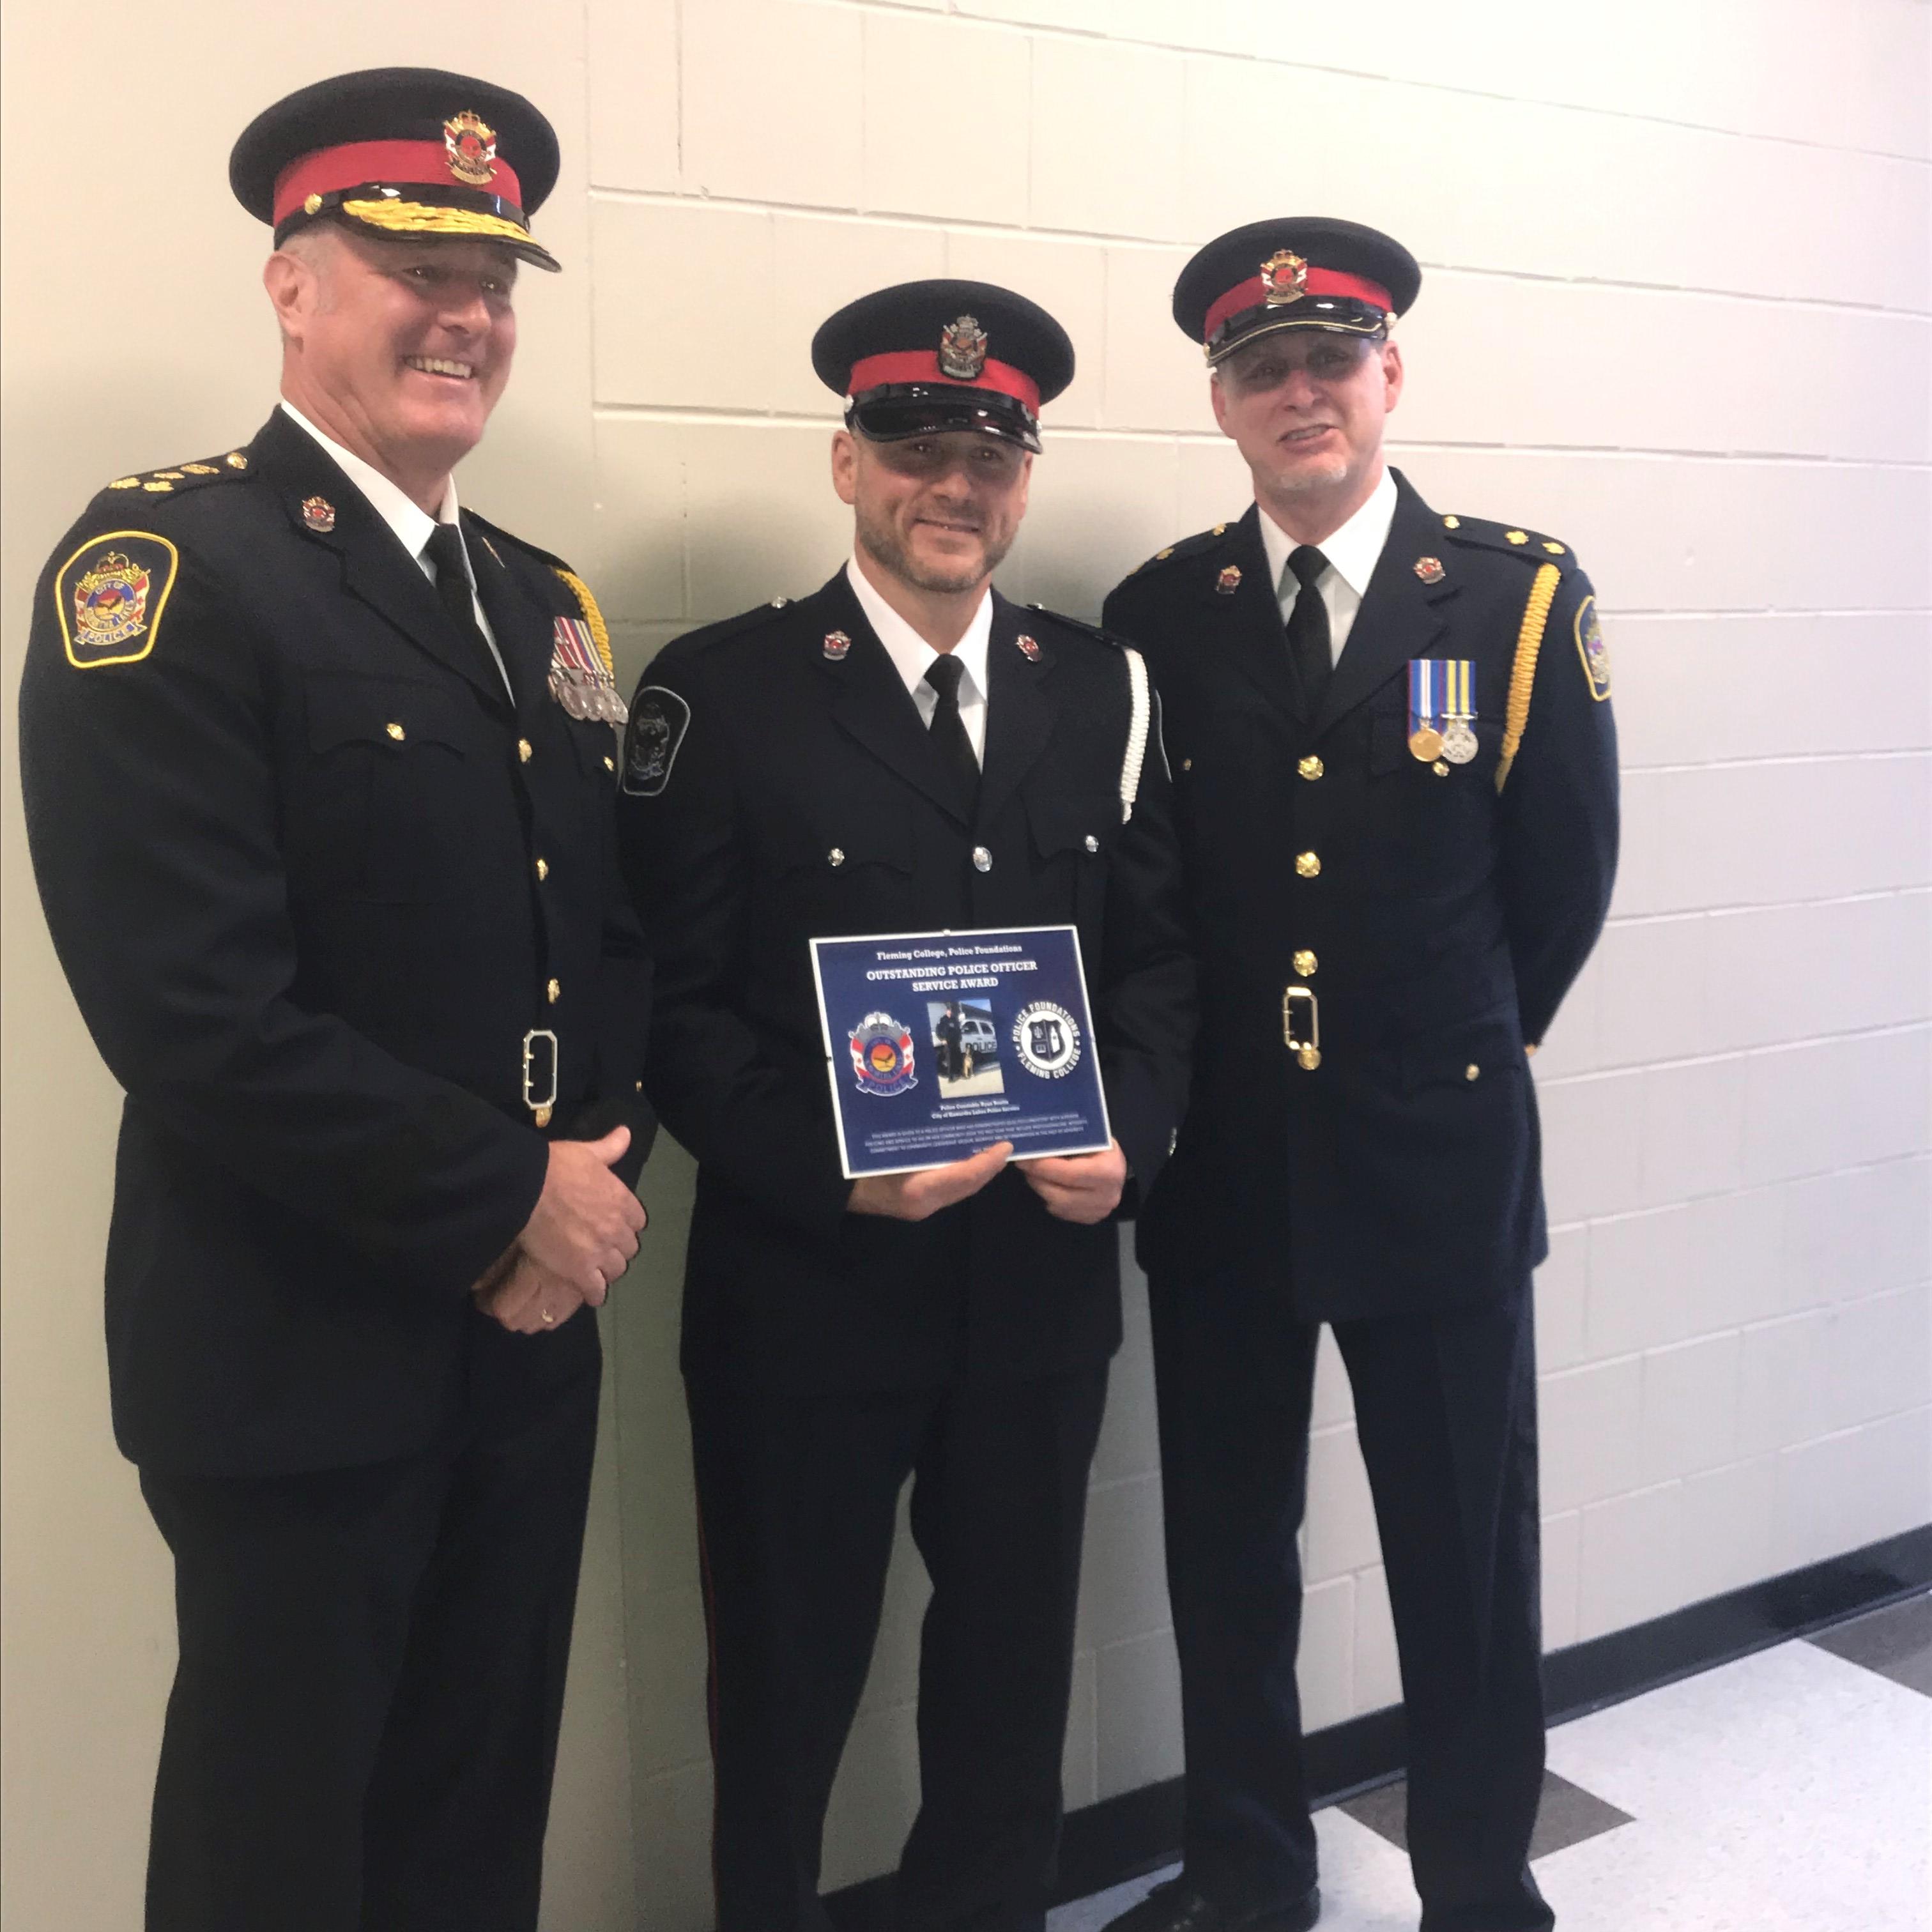 Constable Boutin getting award